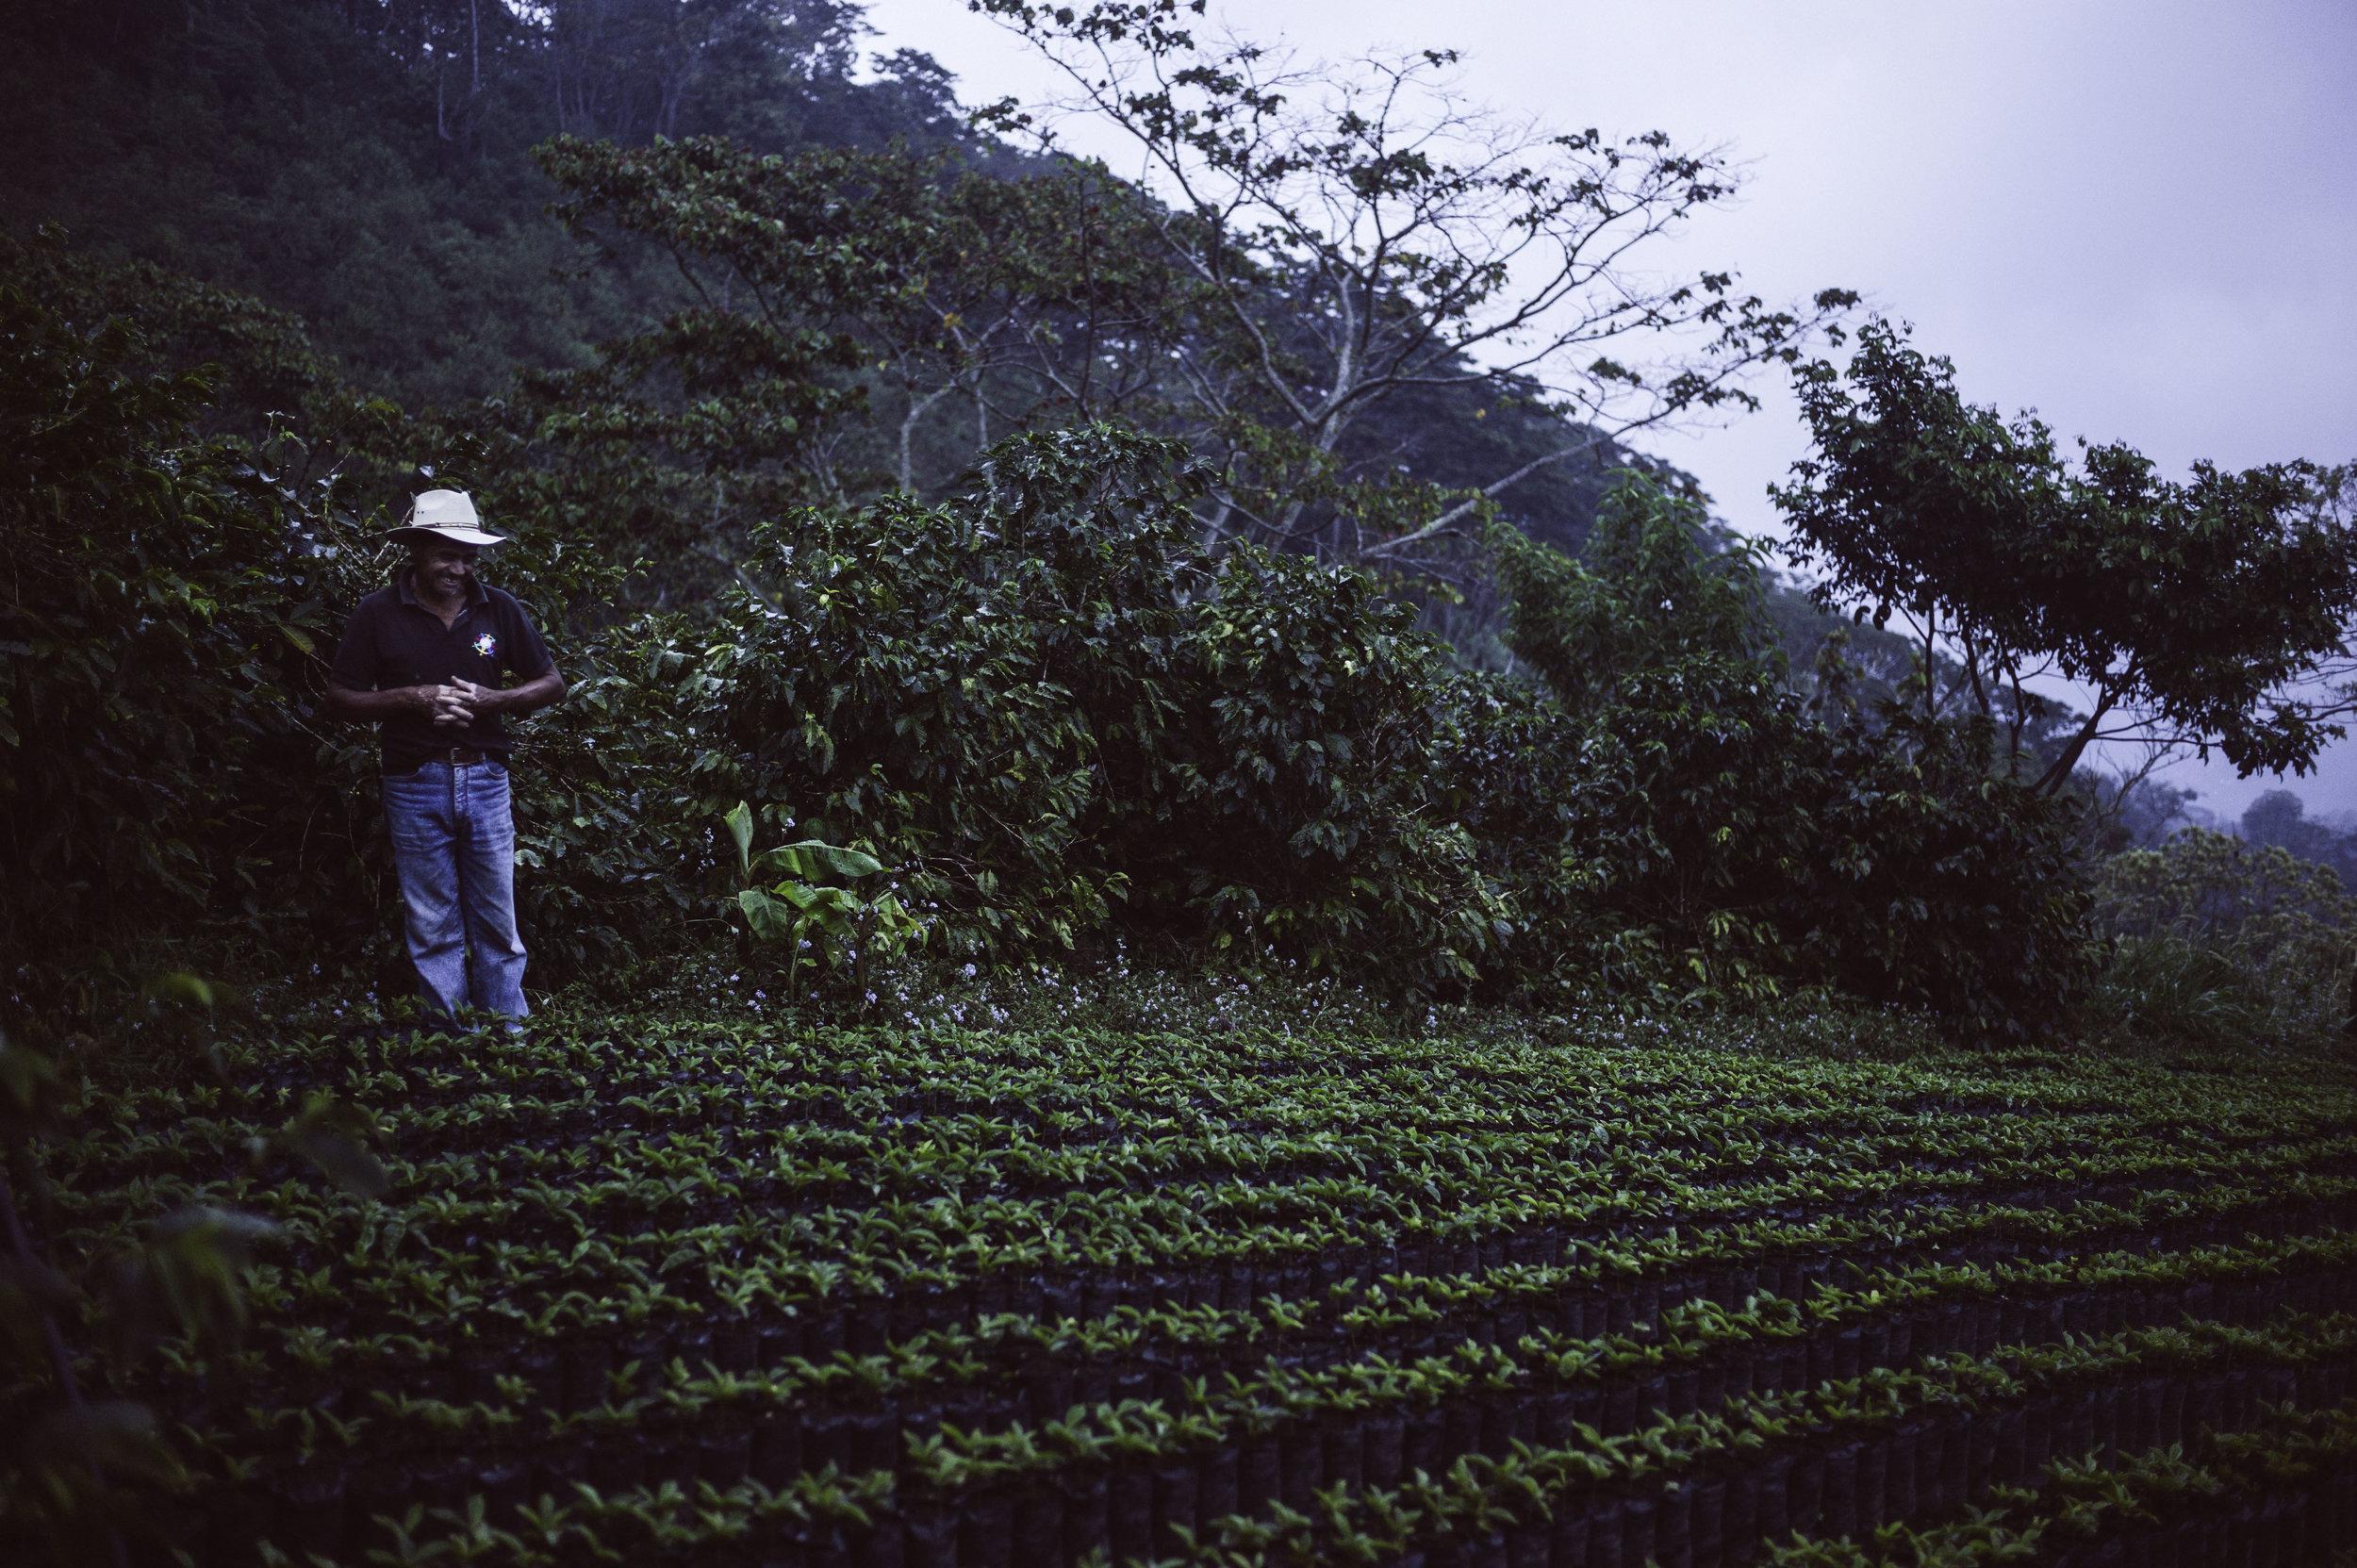 2014_03_06_tk_for_better_coffee_honduras_leica-124_final.jpg